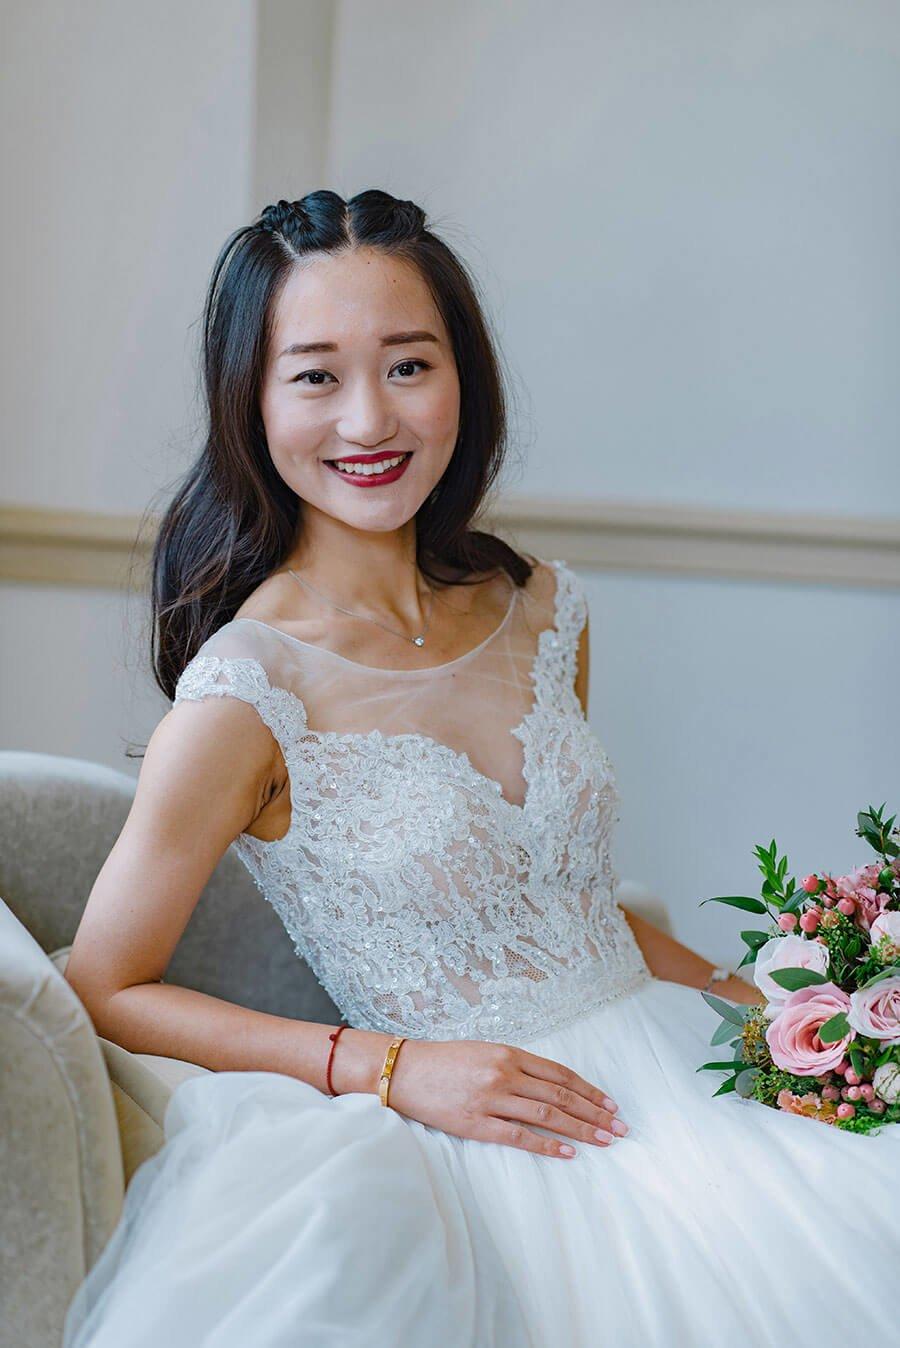 chinese bride wearing white wedding dress